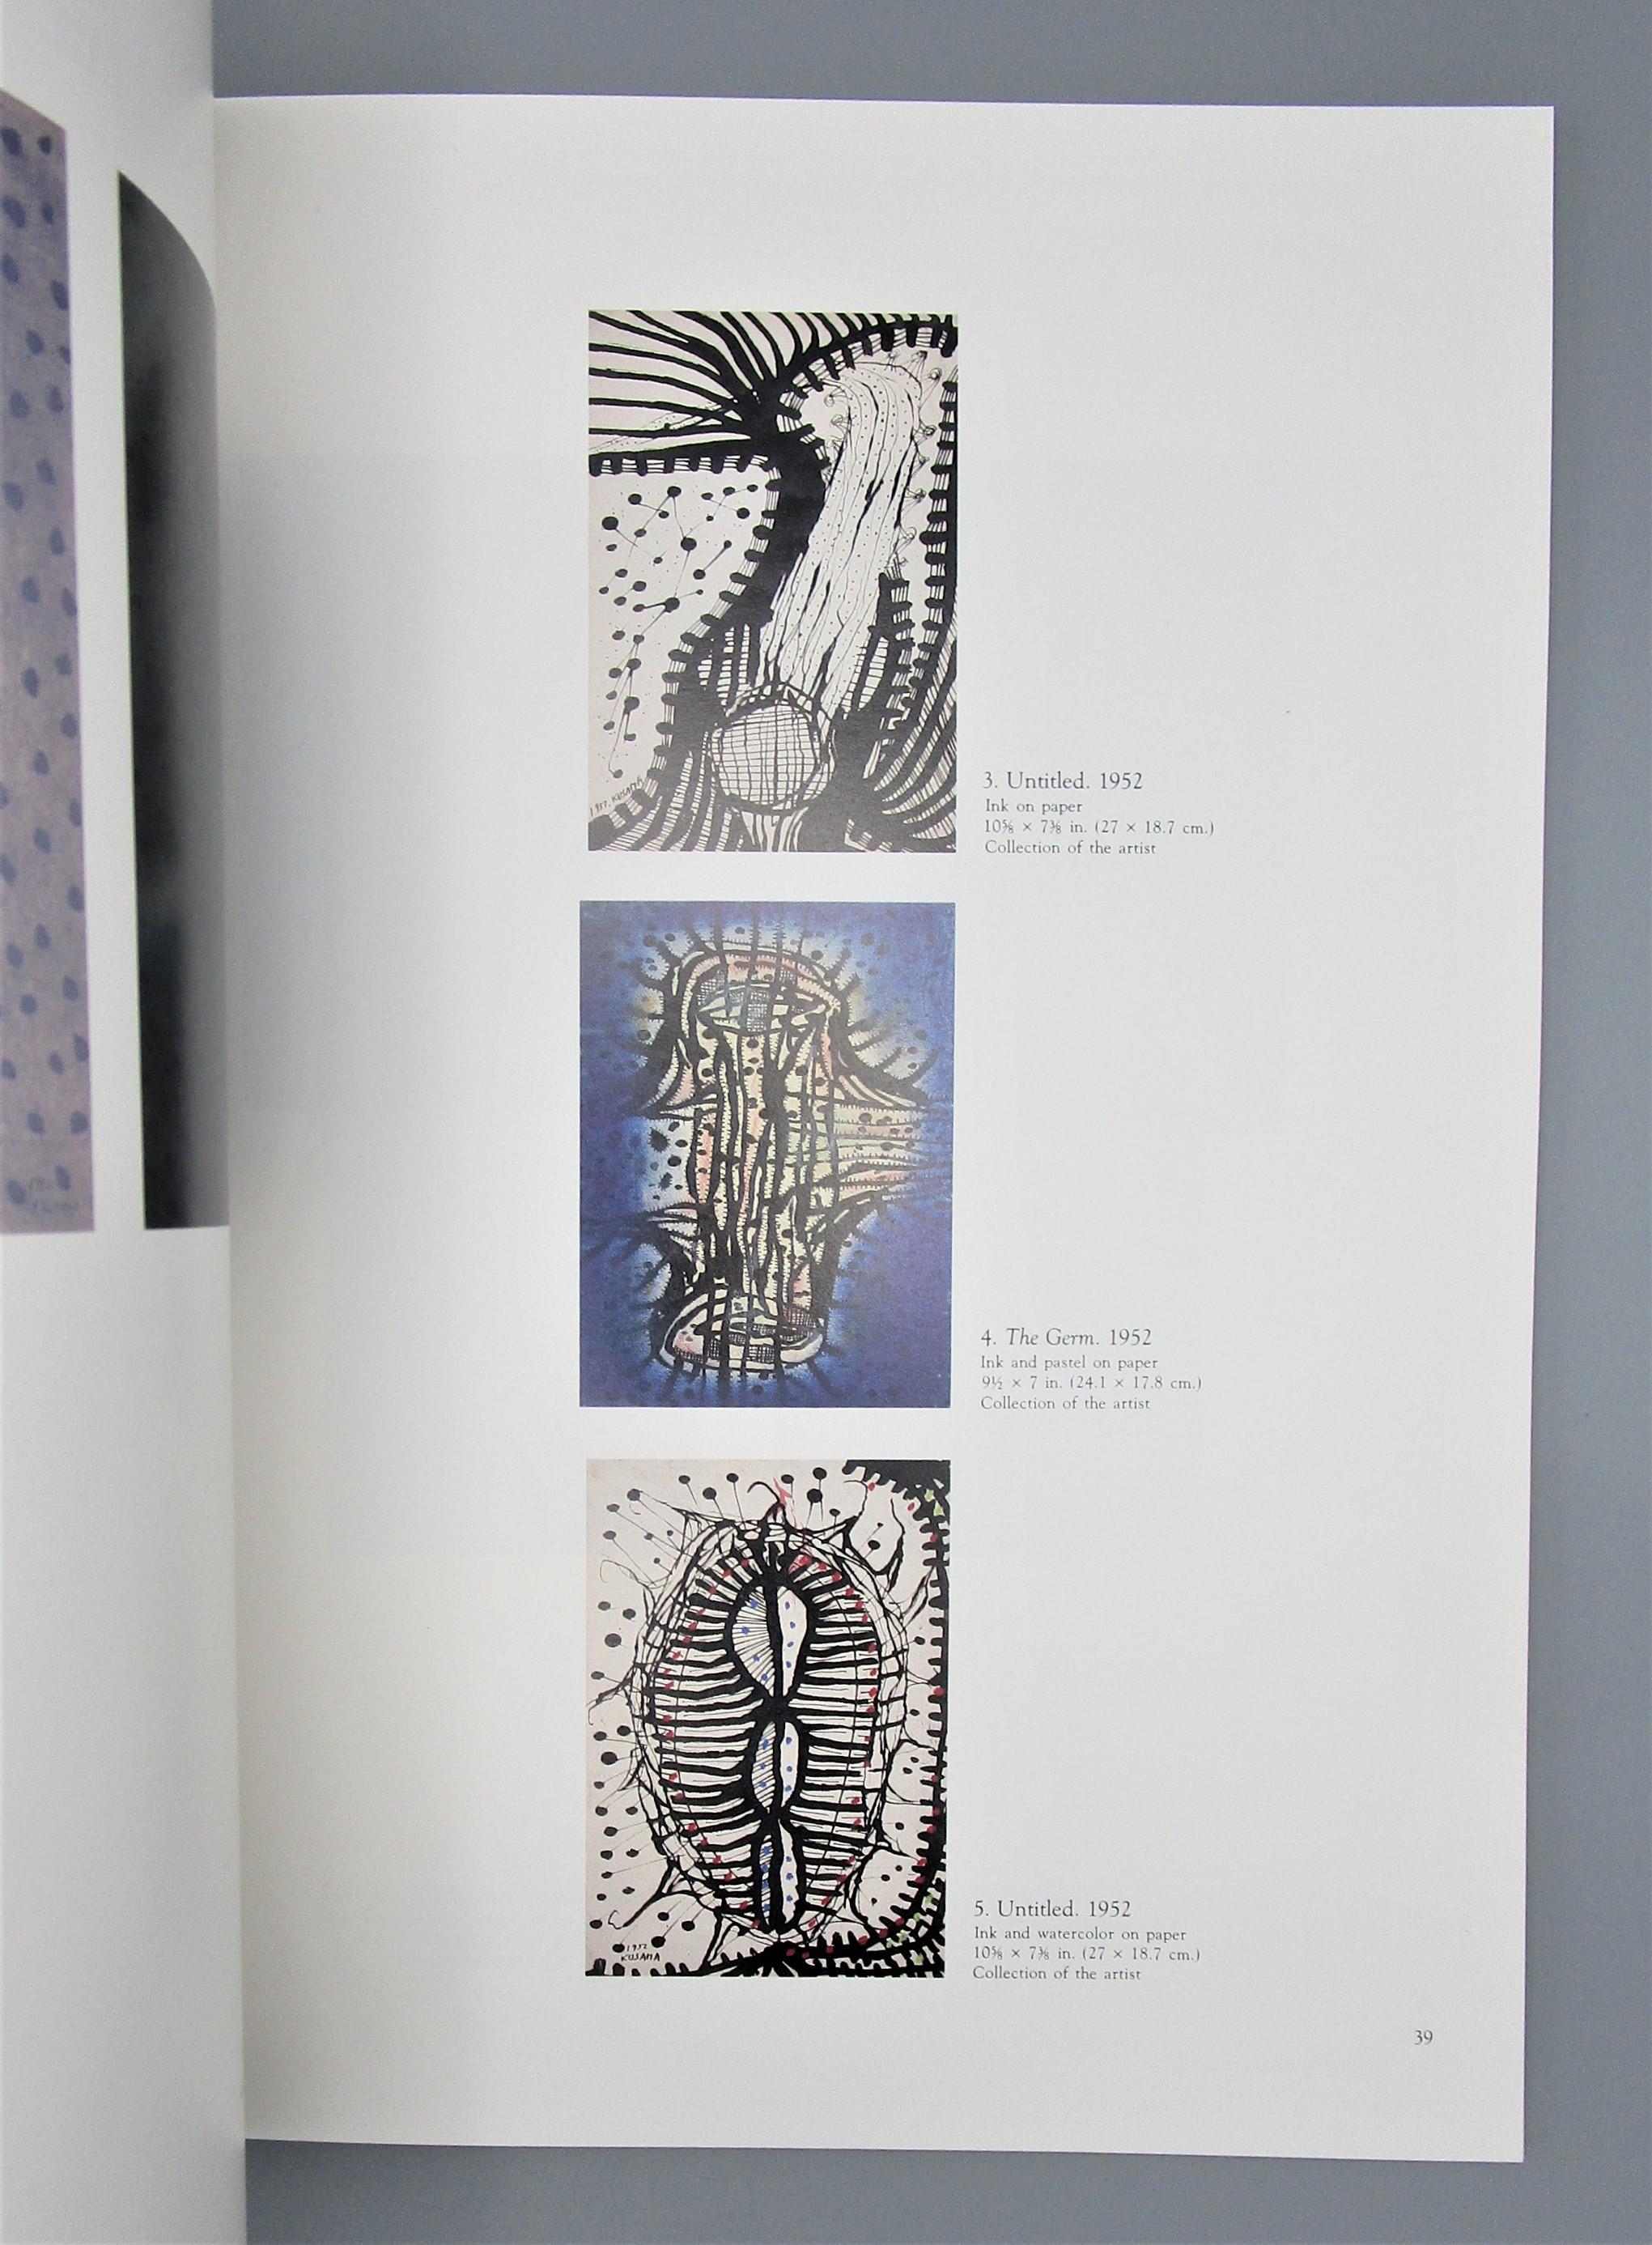 YAYOI KUSAMA: A RETROSPECTIVE, by Center for Int'l Contemporary Arts  - 1989